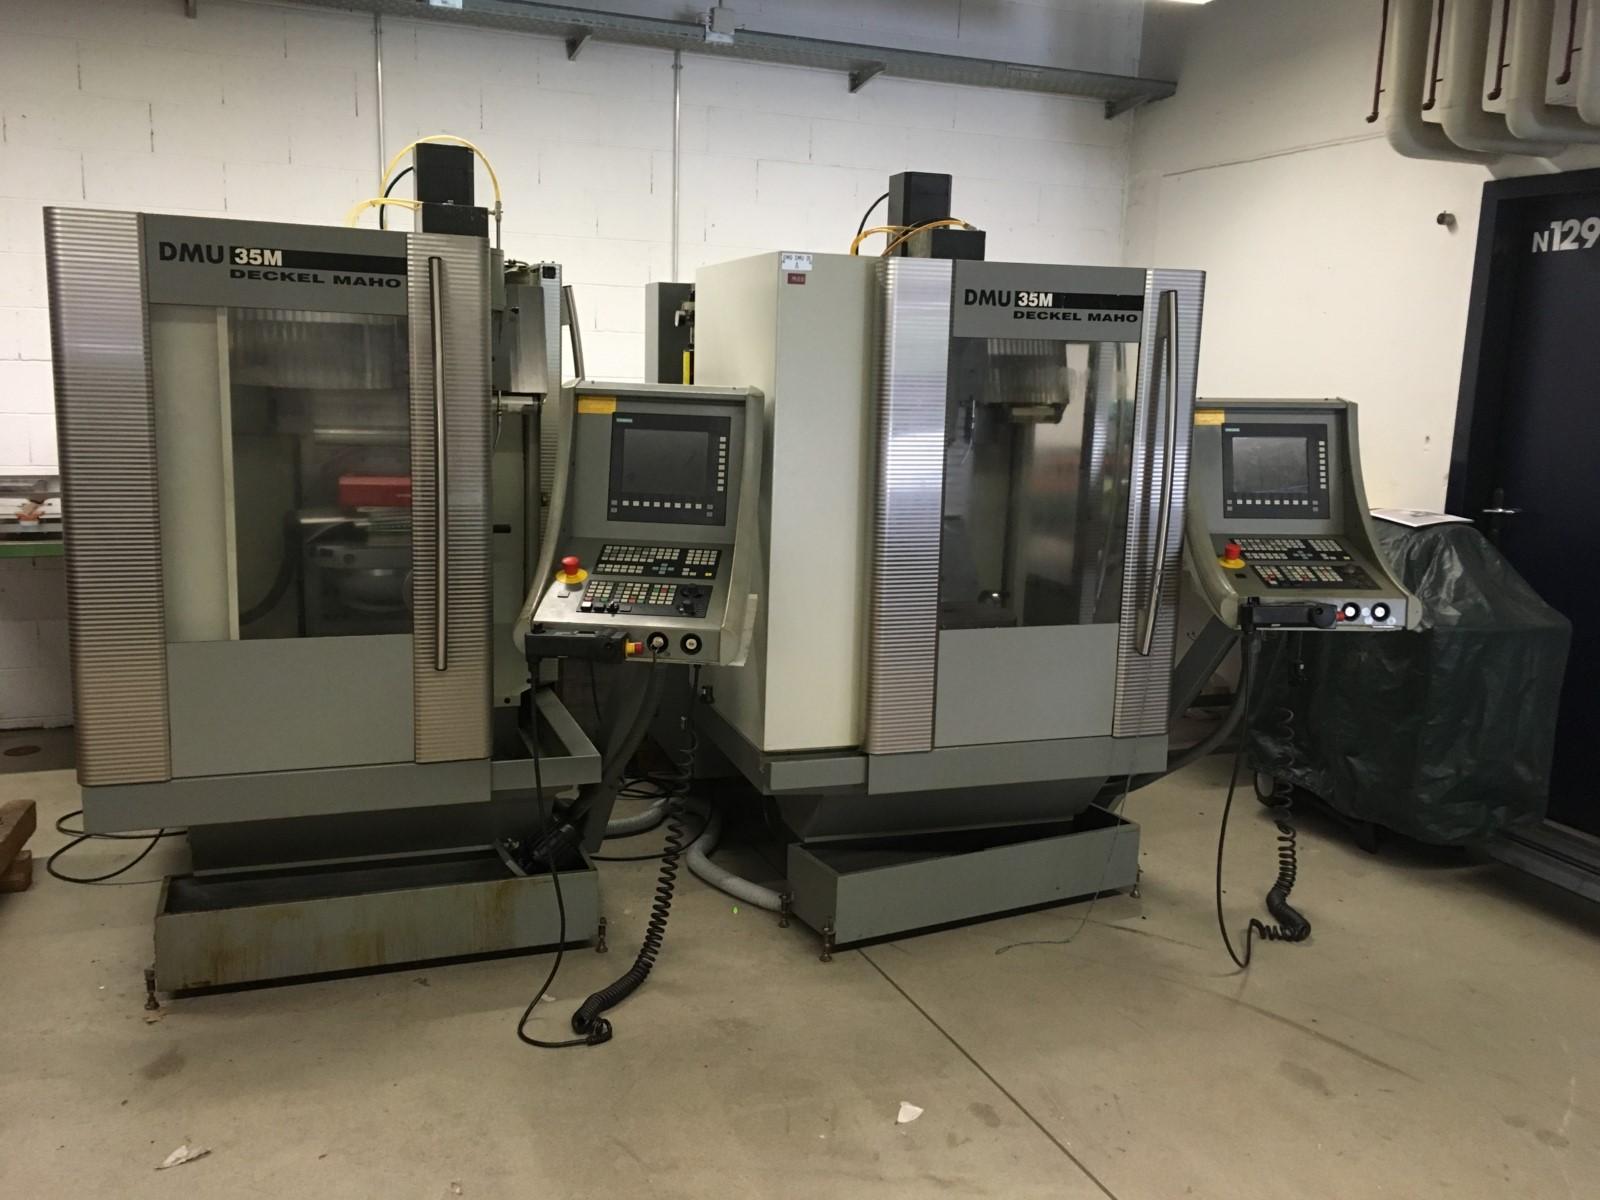 Deckel Maho DMU 35M cnc universal milling machine - Exapro